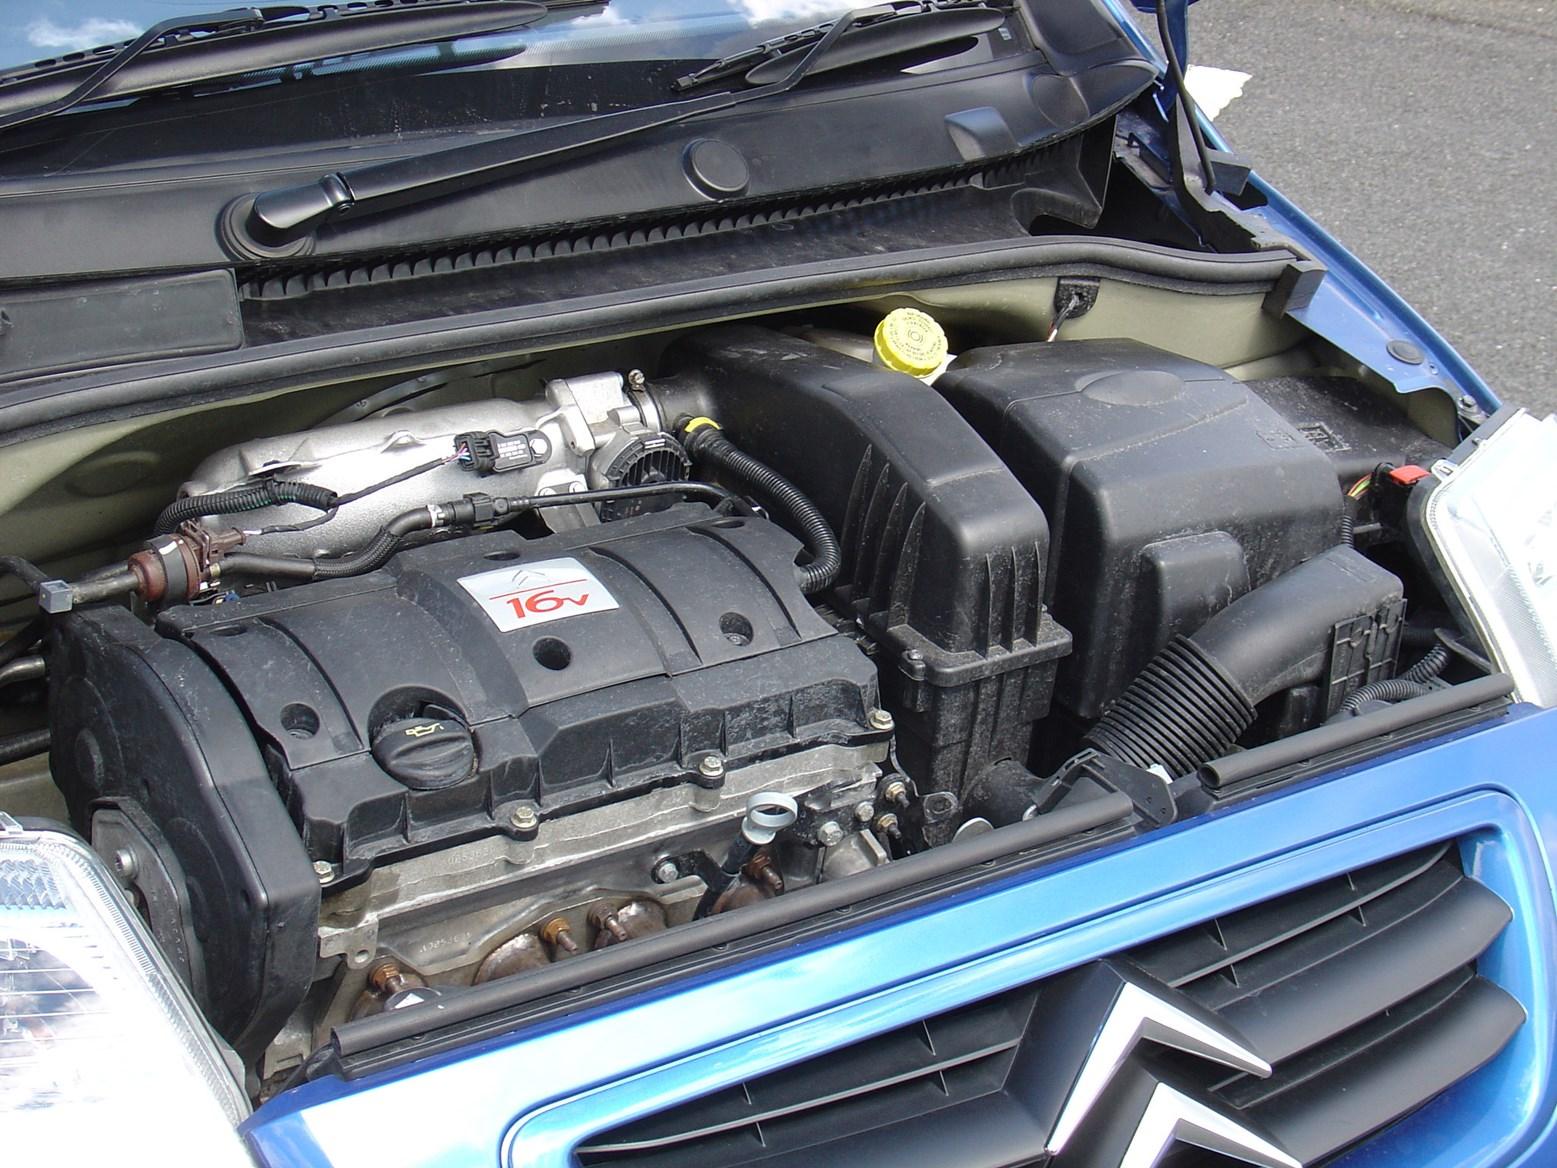 Used Citroën C2 VTS (2004 - 2009) Review   Parkers